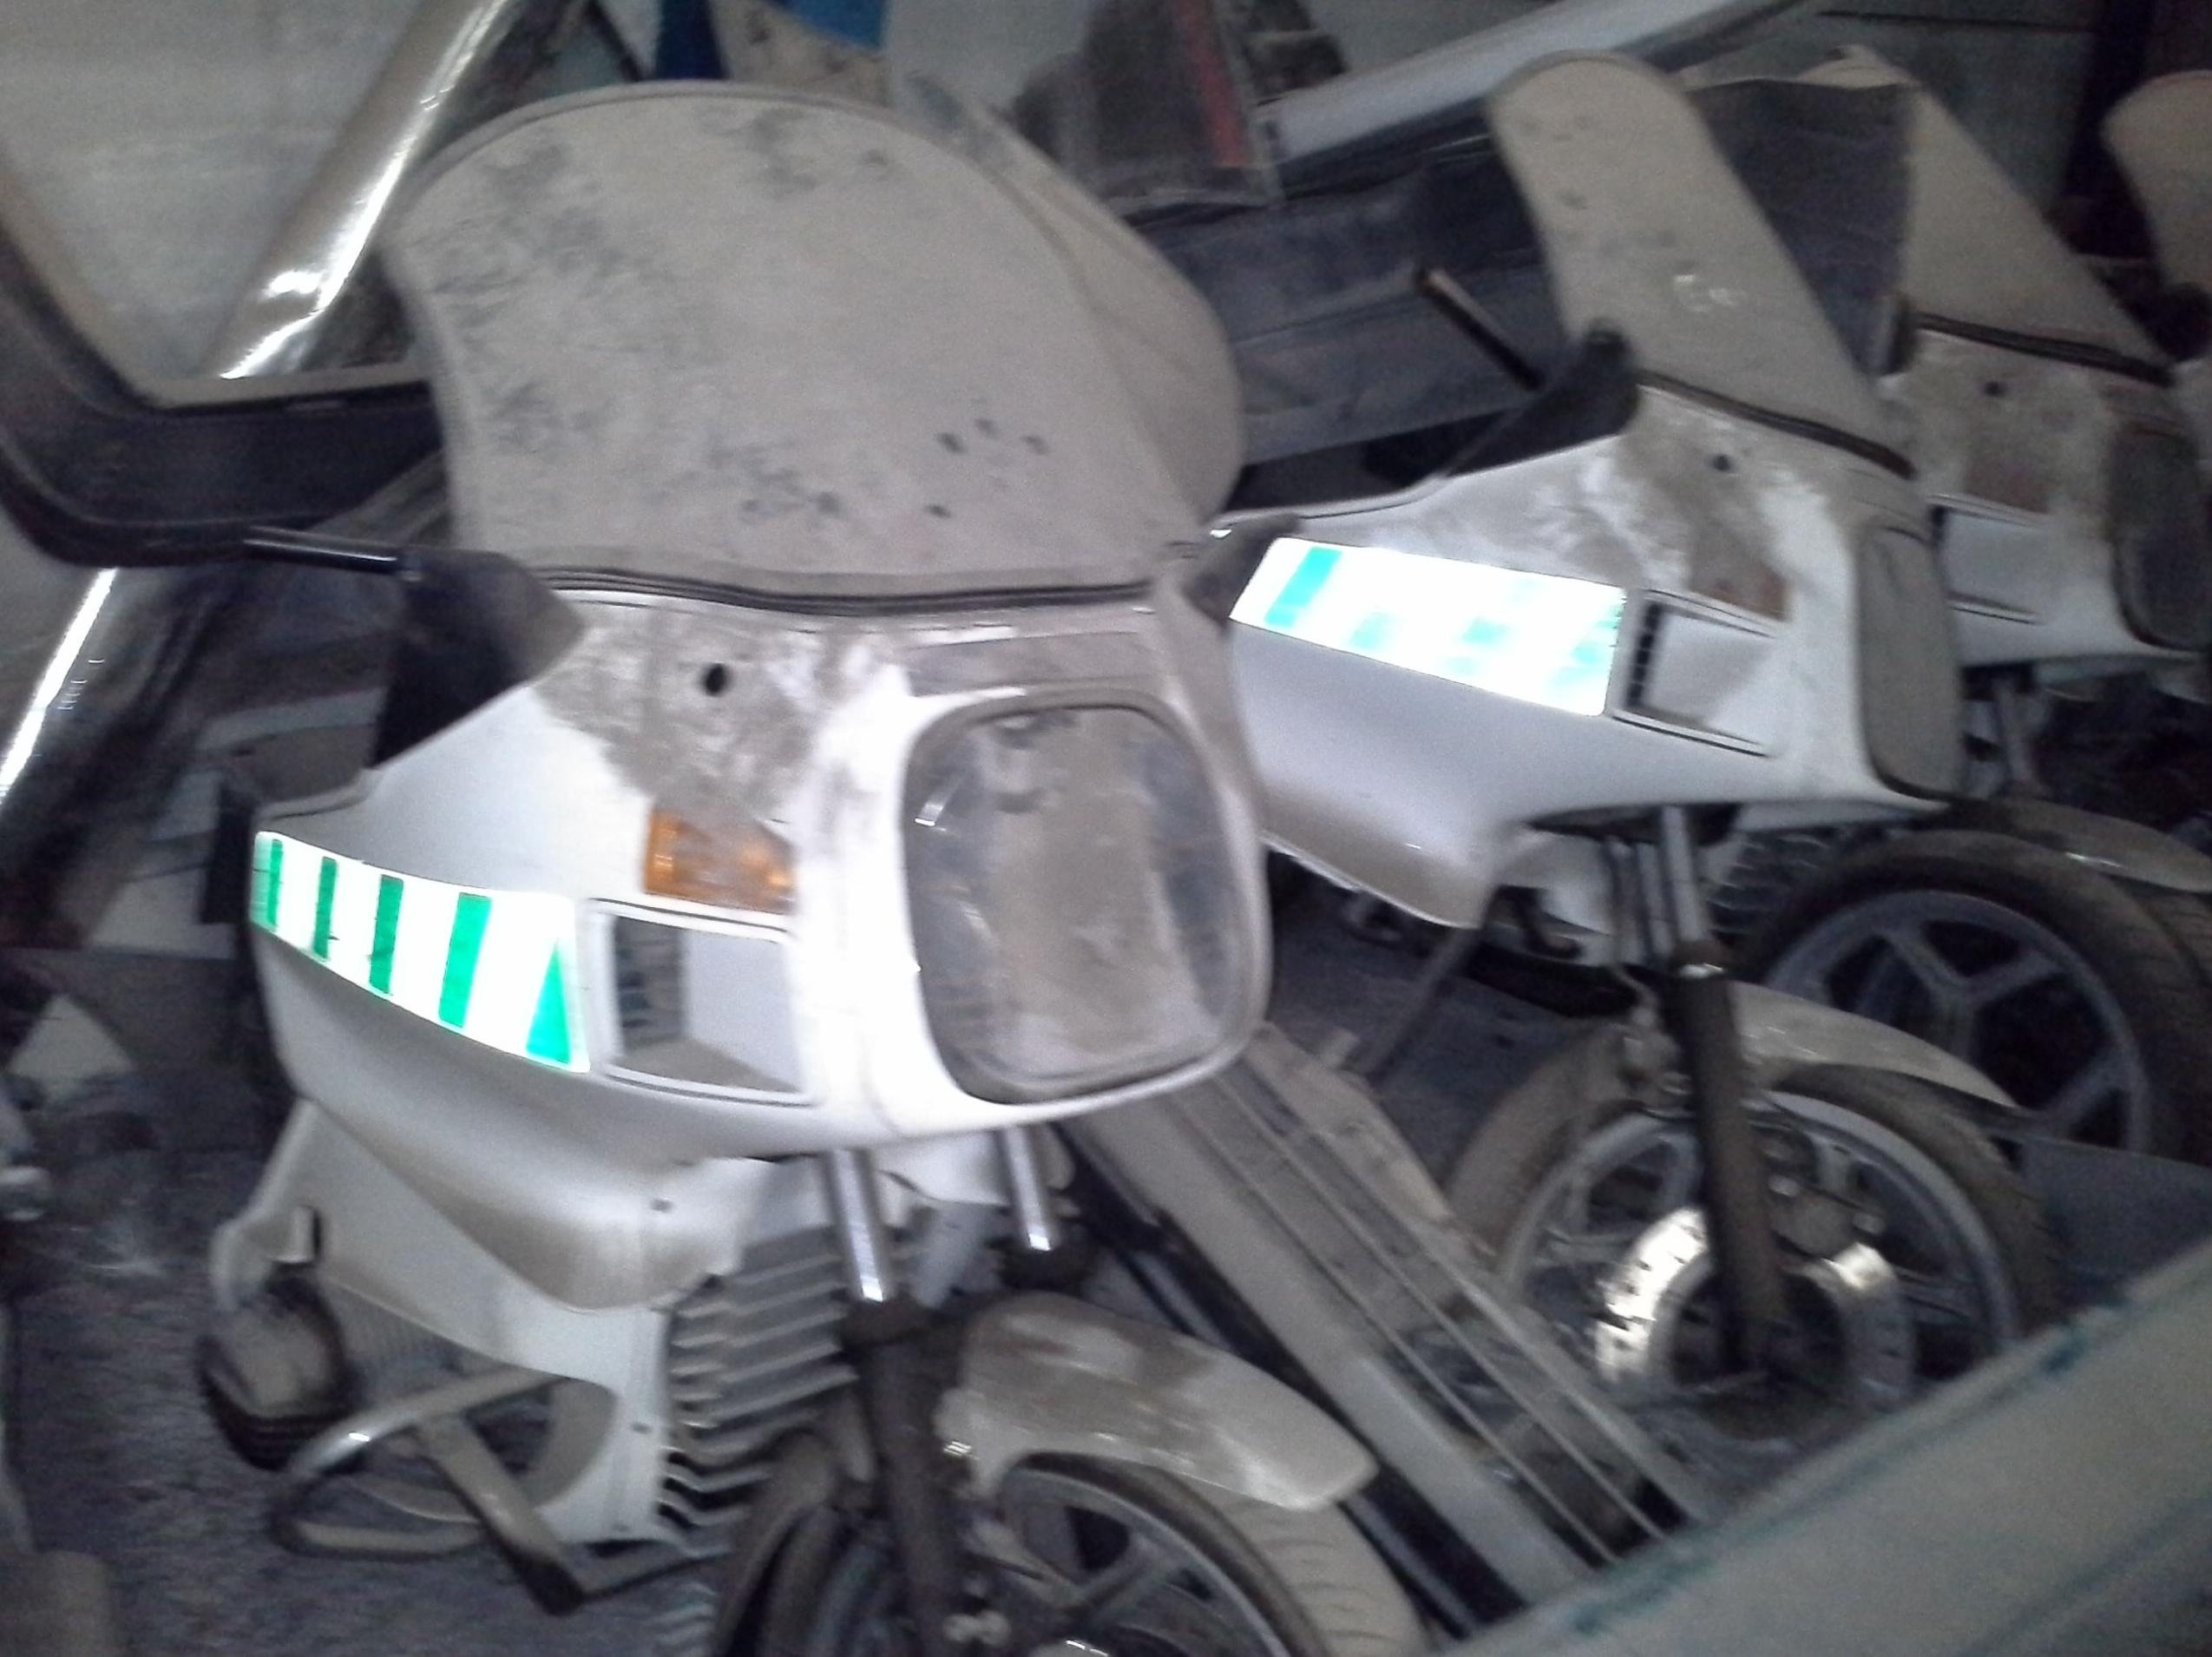 Despiece de motos BMW en Desguaces Clemente de Albacete